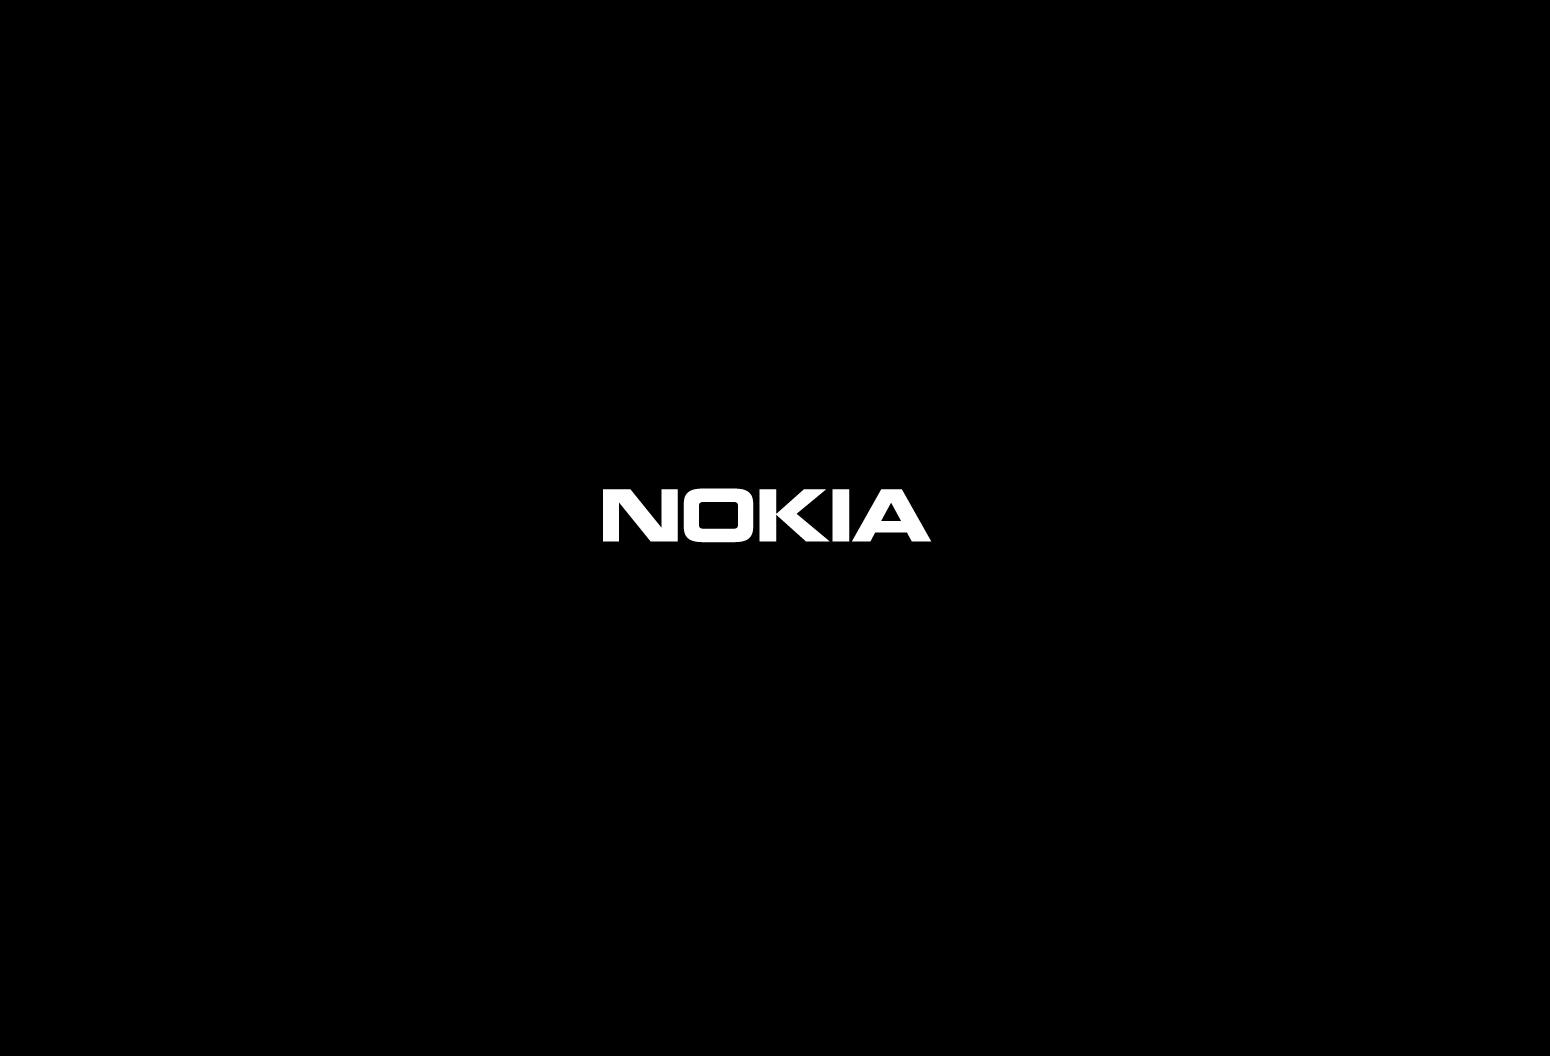 Nokia wallpaper wallpapersafari for Amazing wallpapers for nokia